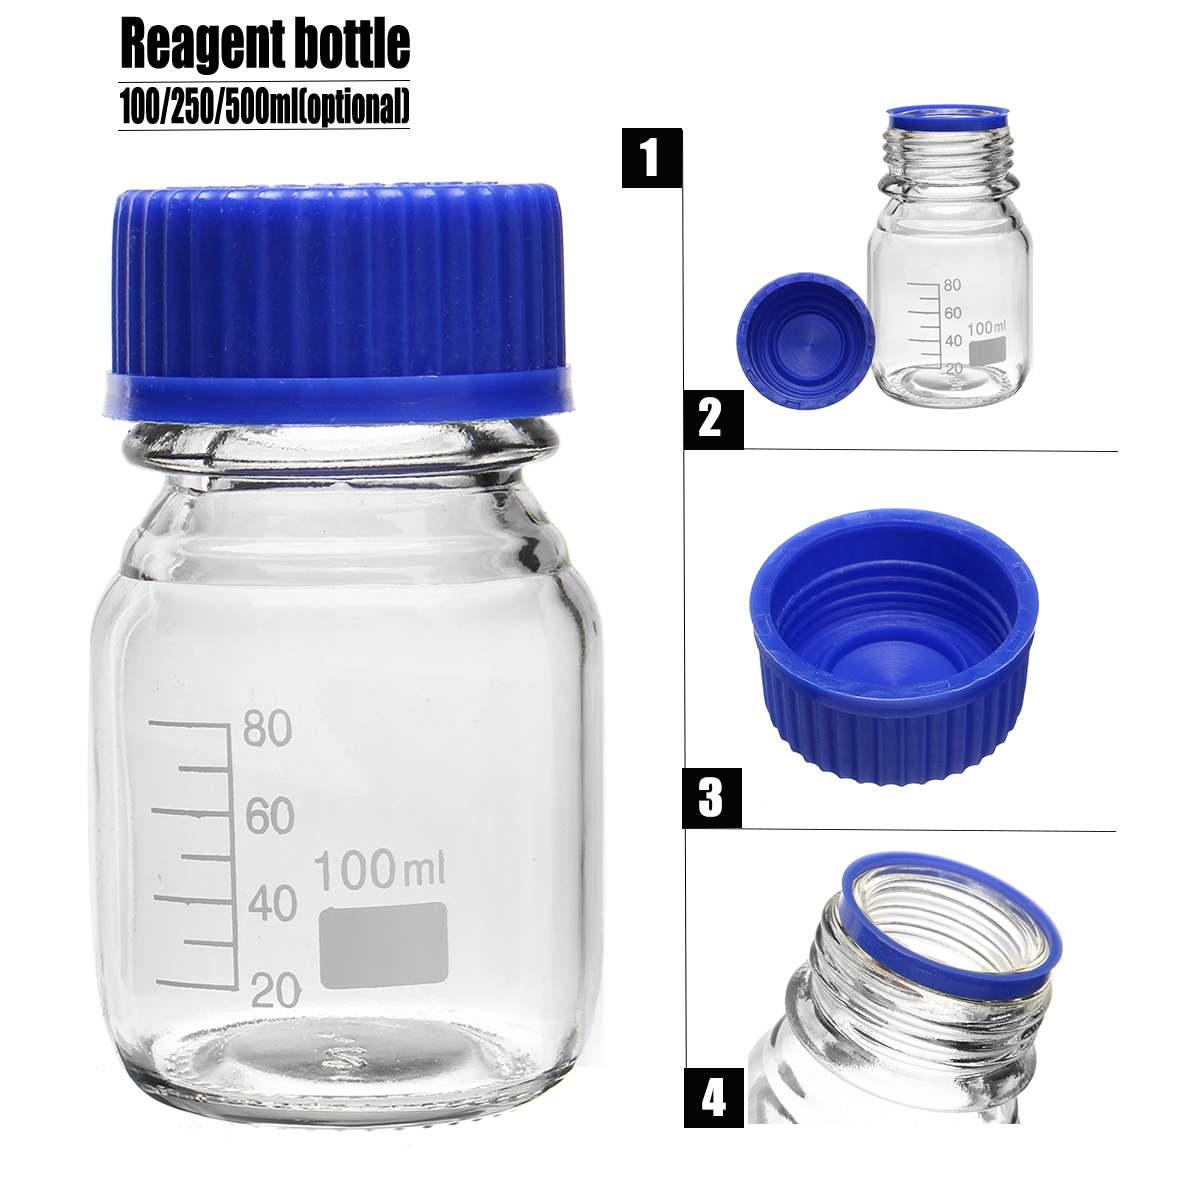 4pcs Glass Reagent Bottle With Blue Screw Cover Cap 100ml Graduation Sample Vials Plastic Lid School Supplies Lab Equipments